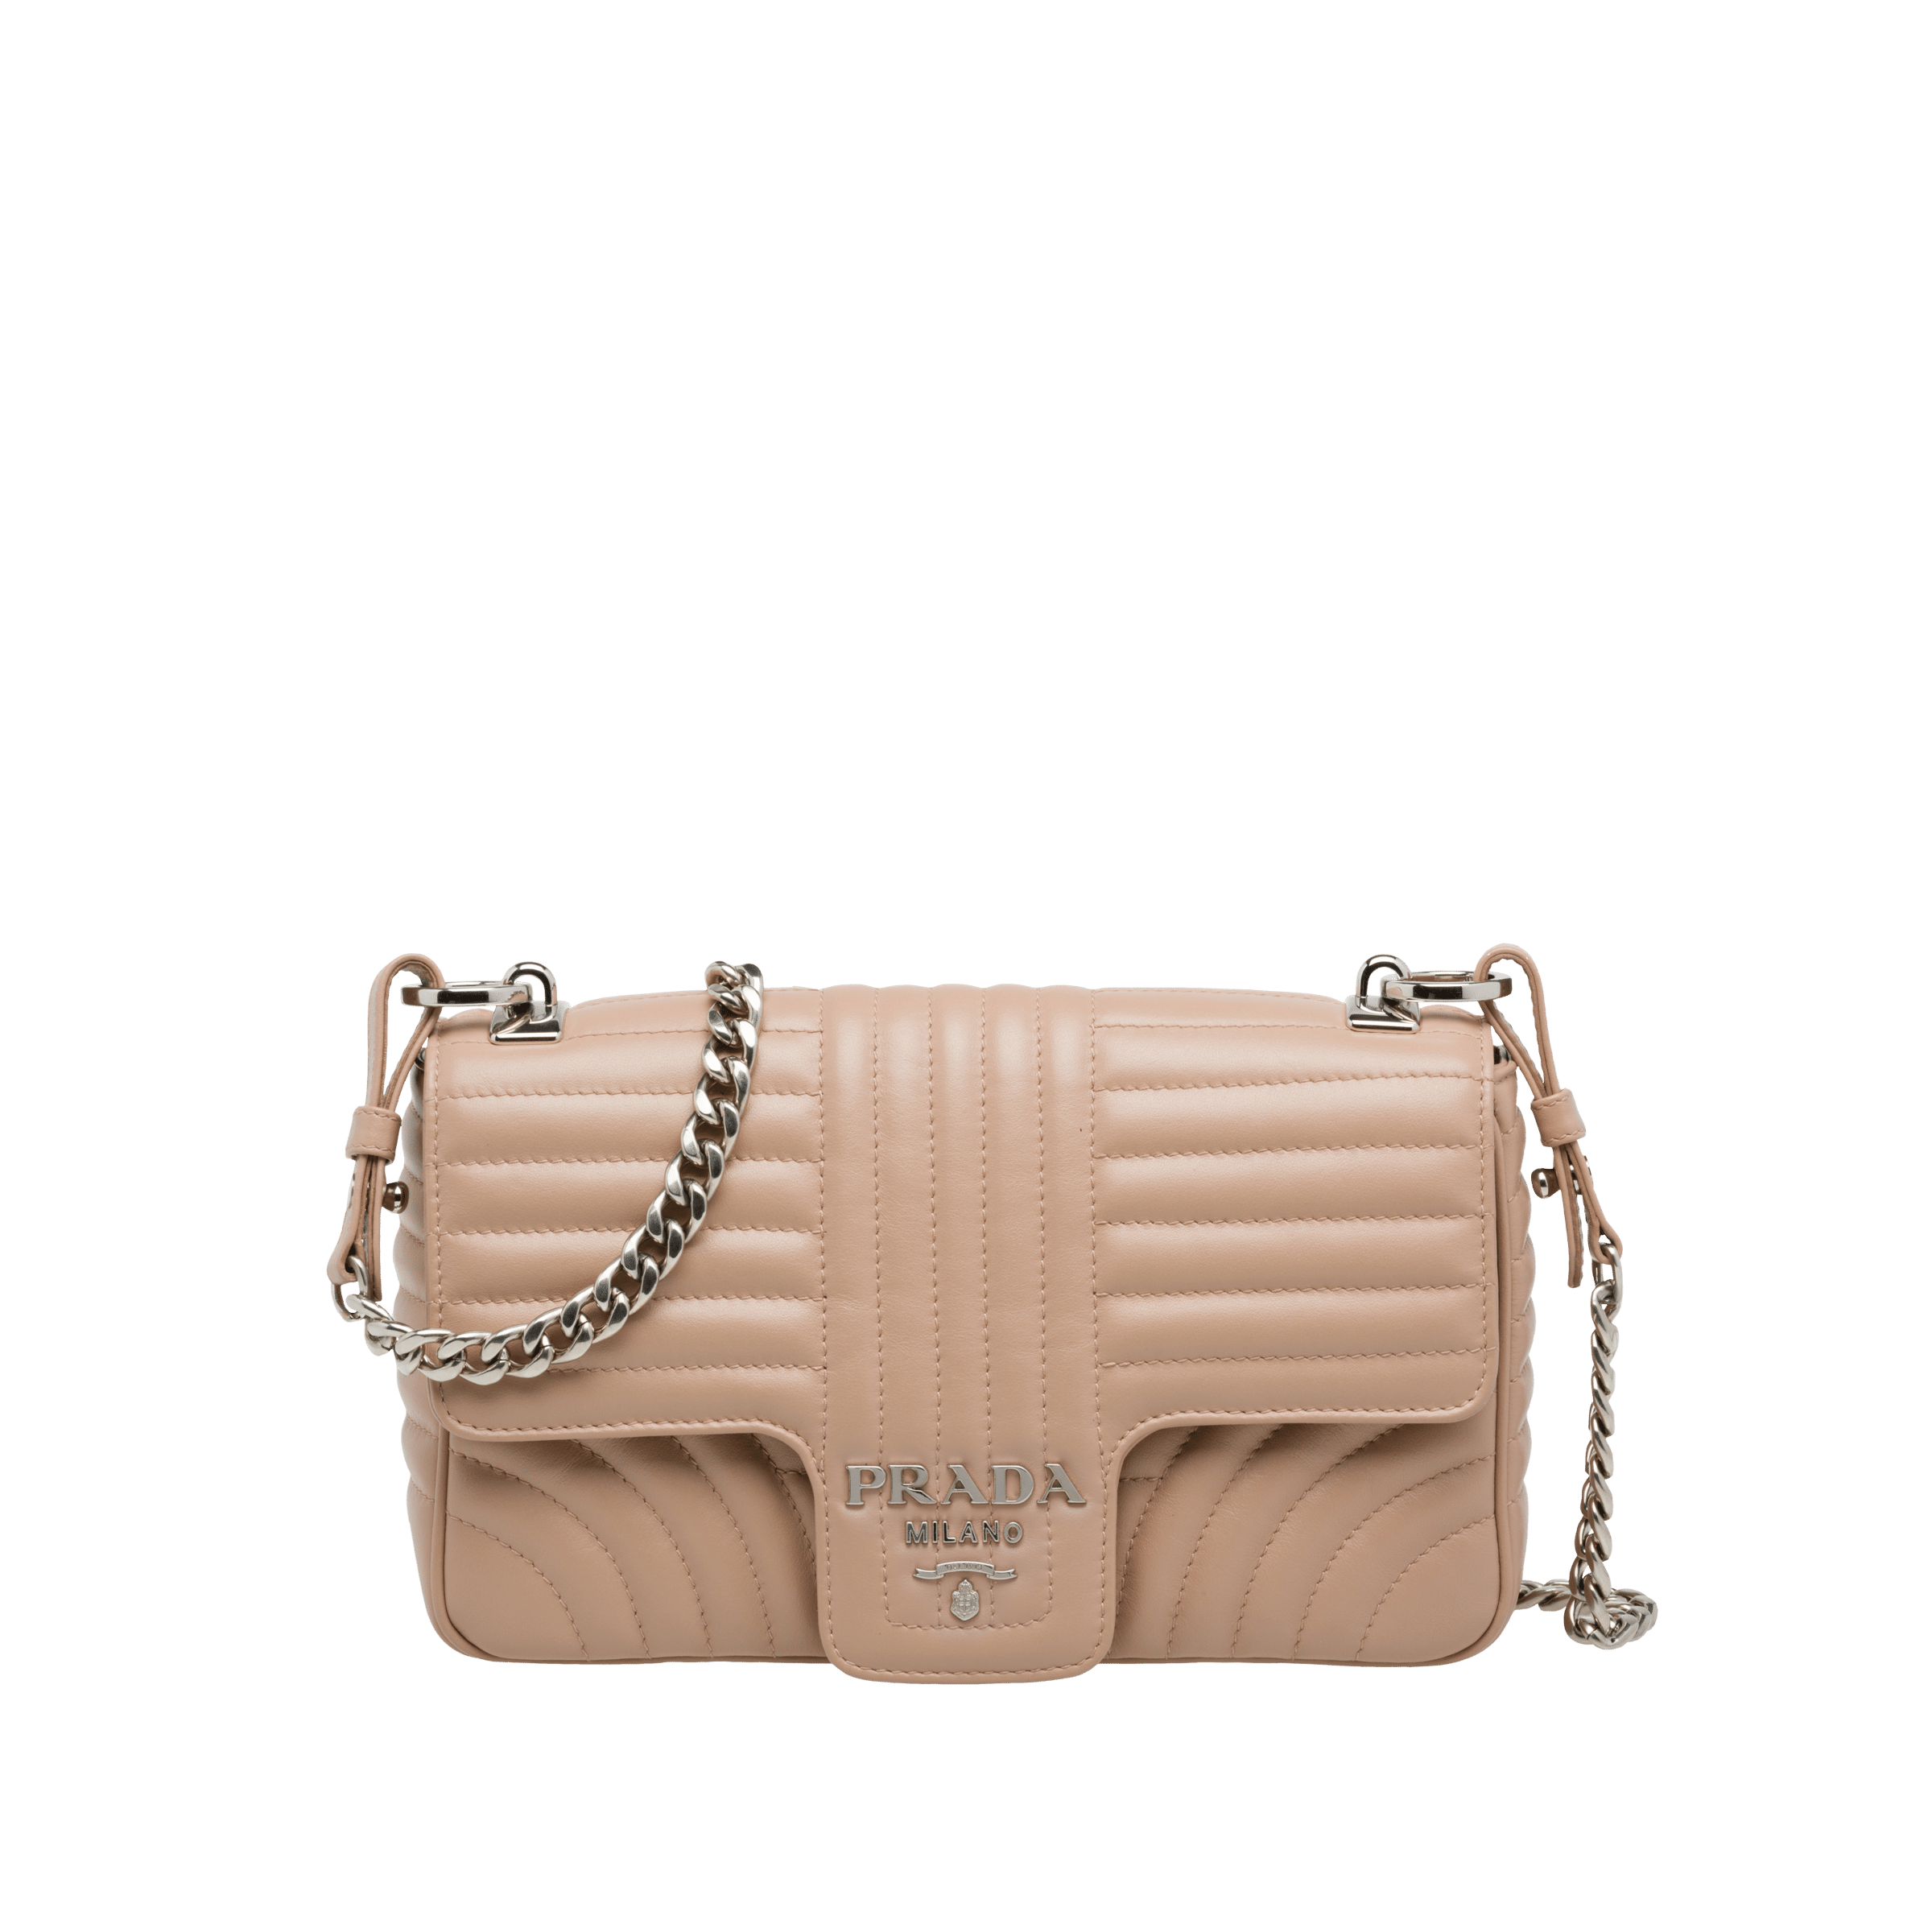 22fcb3fbef5b Prada Diagramme leather shoulder bag | Prada - 1BD108_2D91_F0236_V_COI